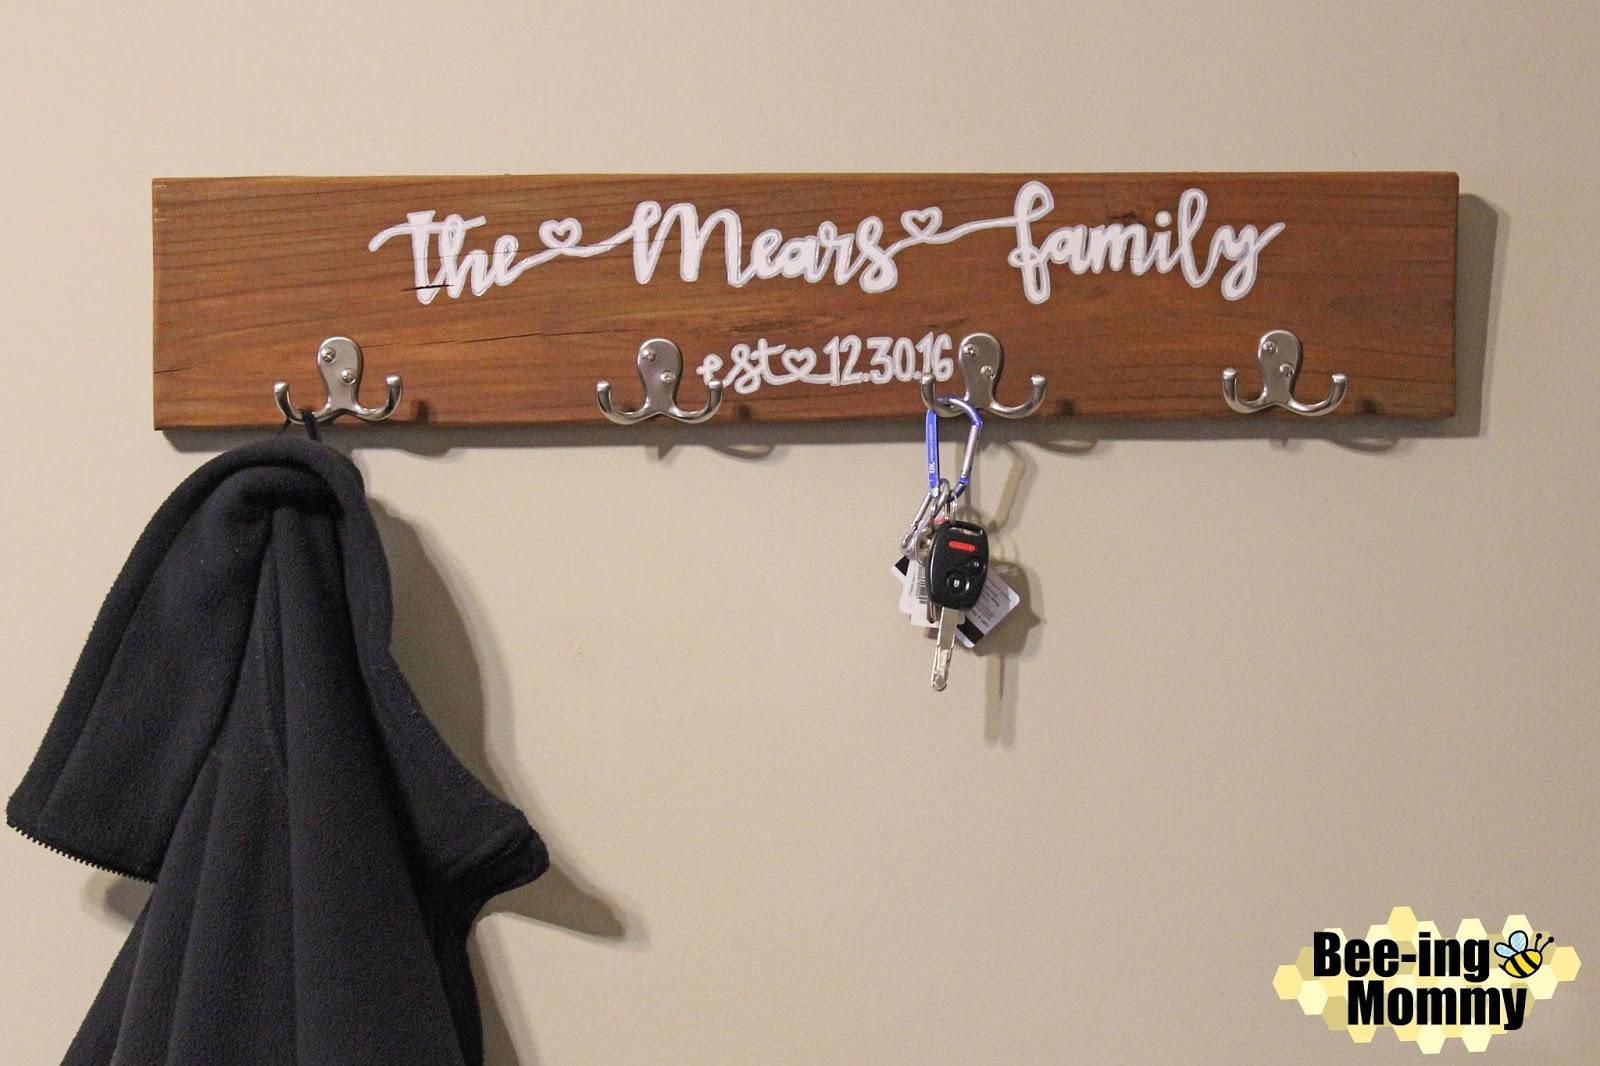 Personalized Wood Coat Rack